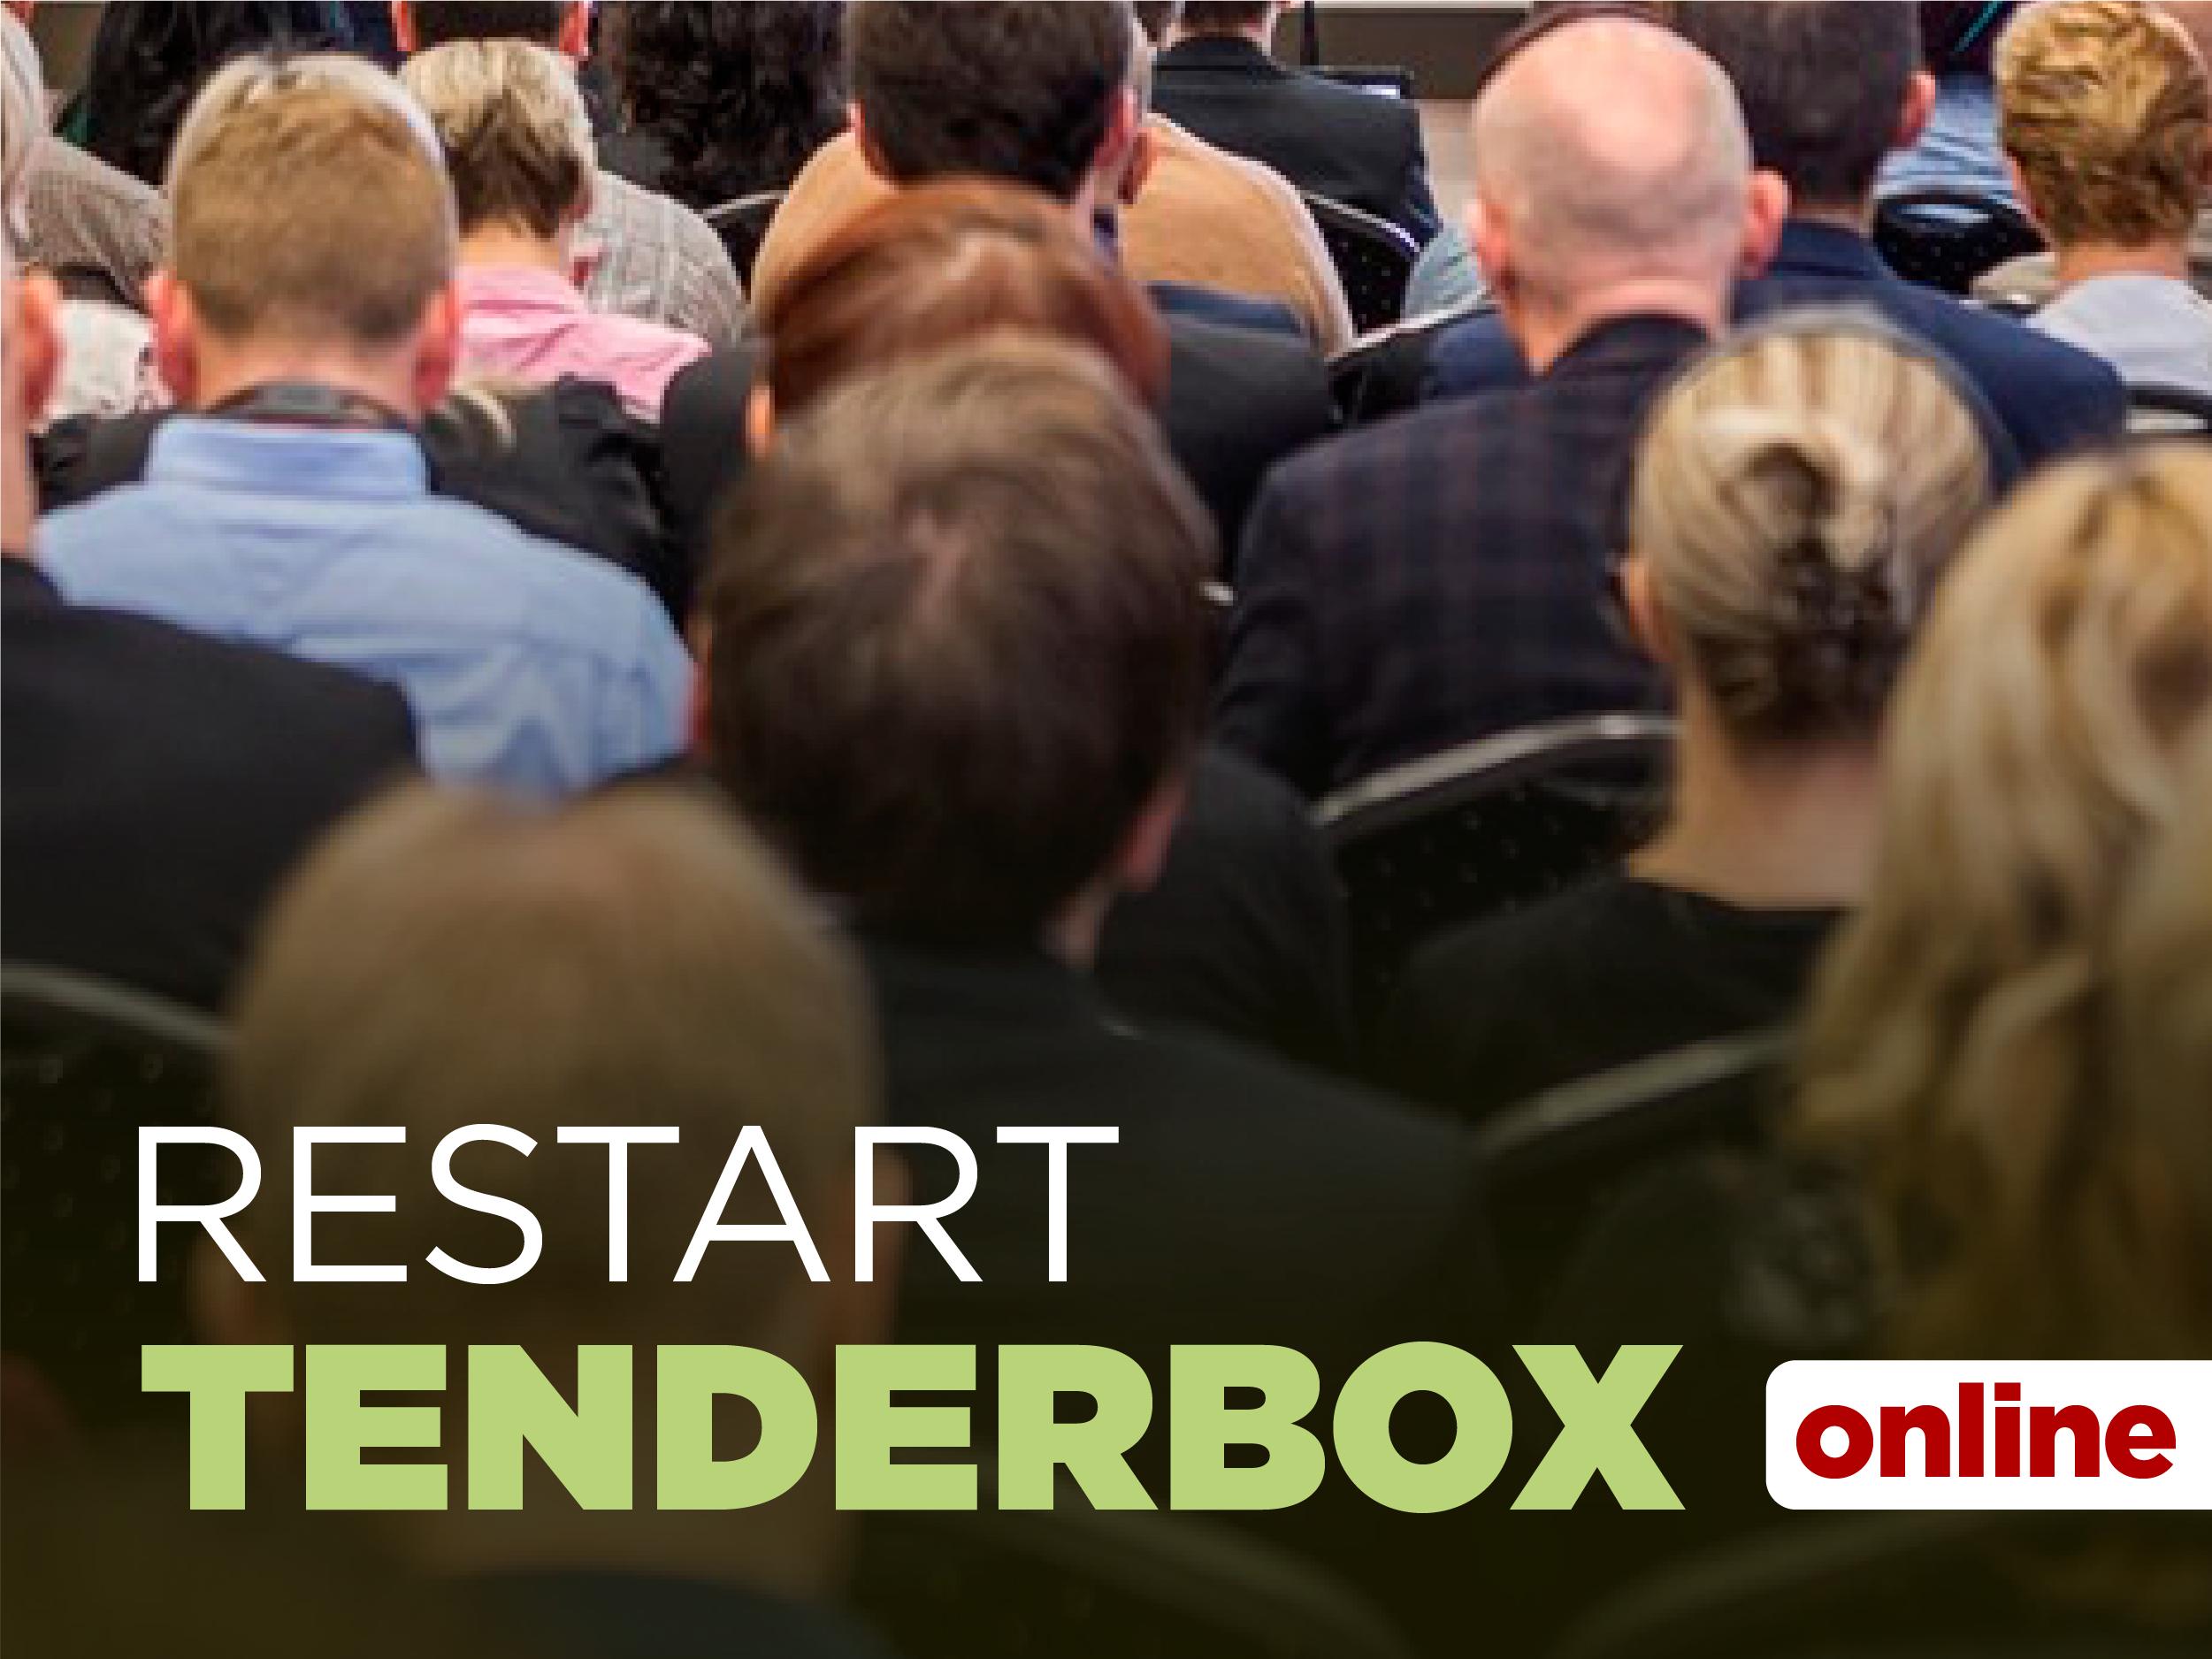 TENDERBOX - pravidelné školení